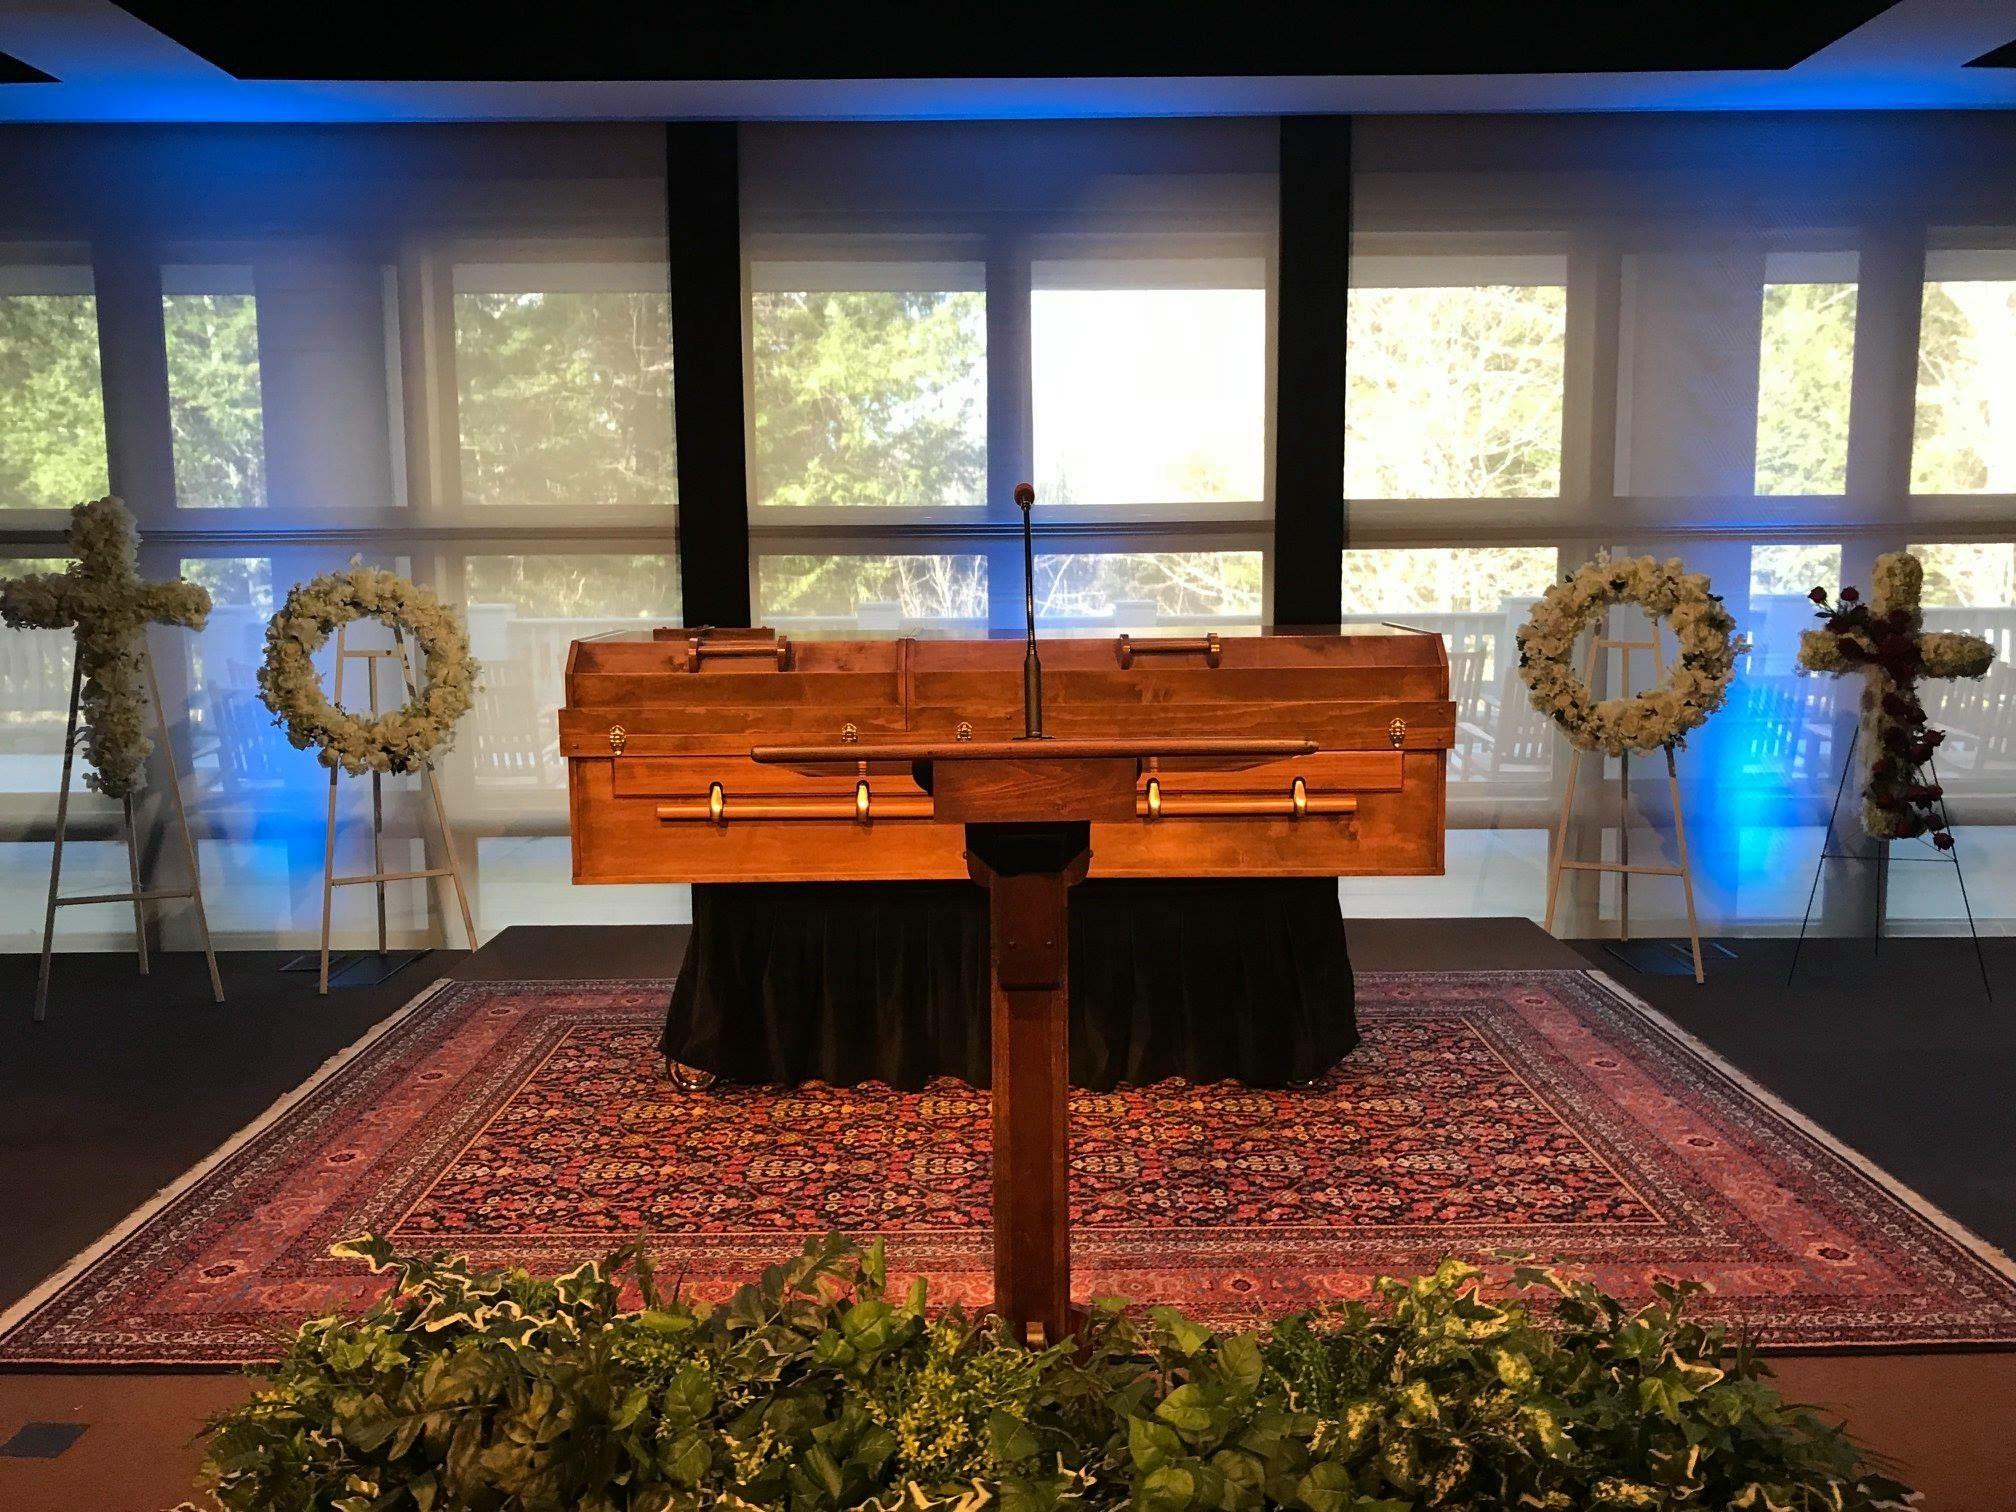 Billy graham billy graham billy graham funeral pastor